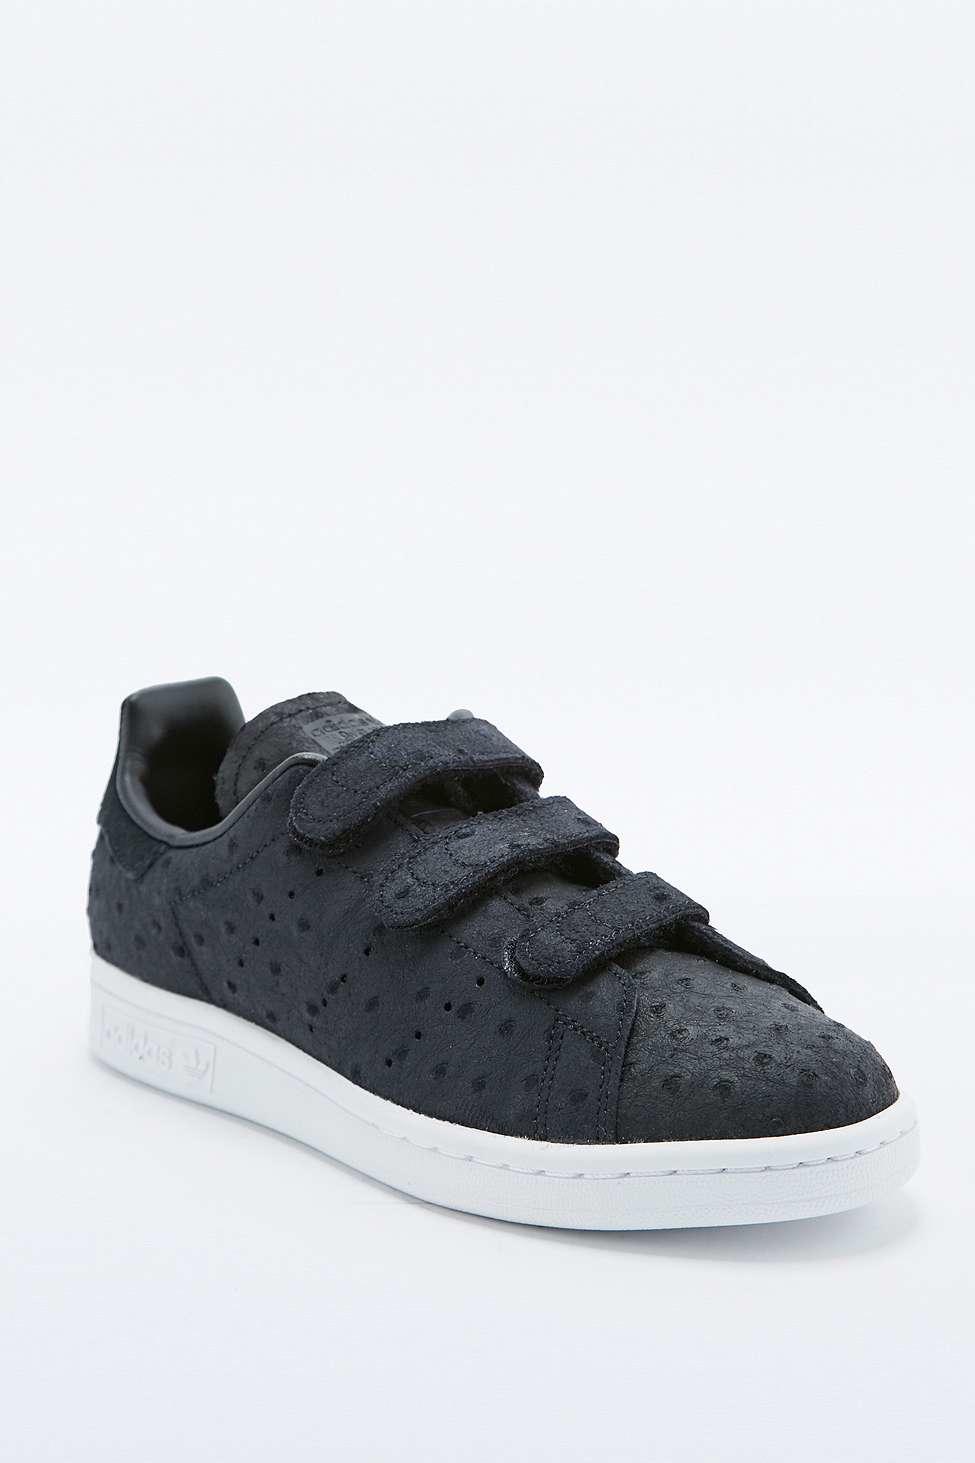 Mens Adidas Stan Smith Leather Velcro